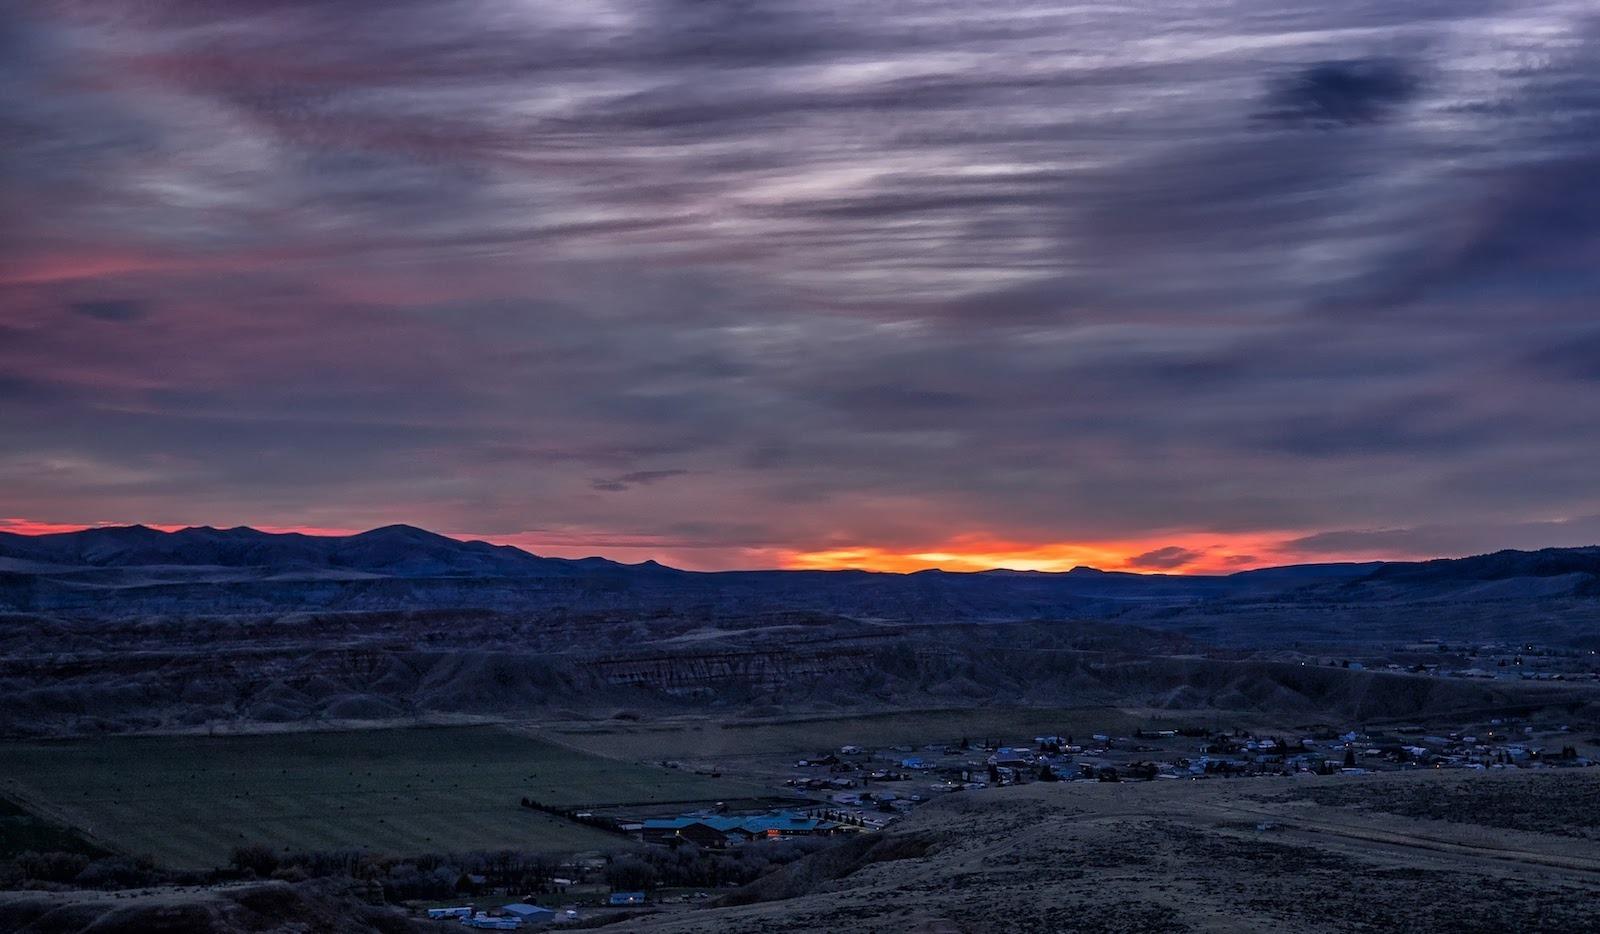 Sunrise over Dubois, Wyoming, as seen from the Dubois Overlook